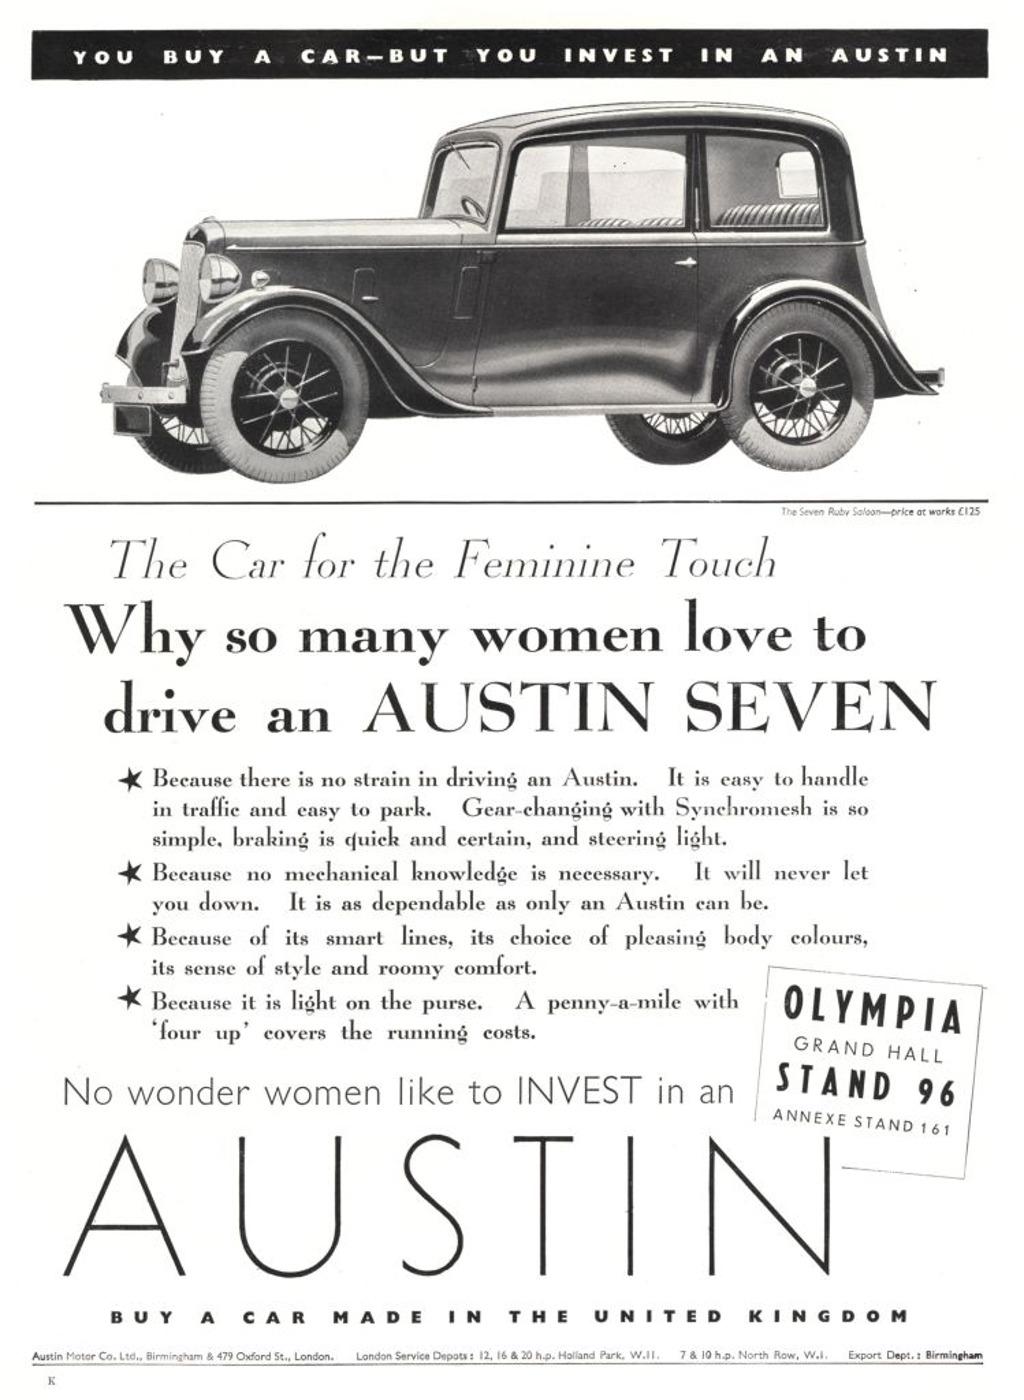 Austin7 advertisment